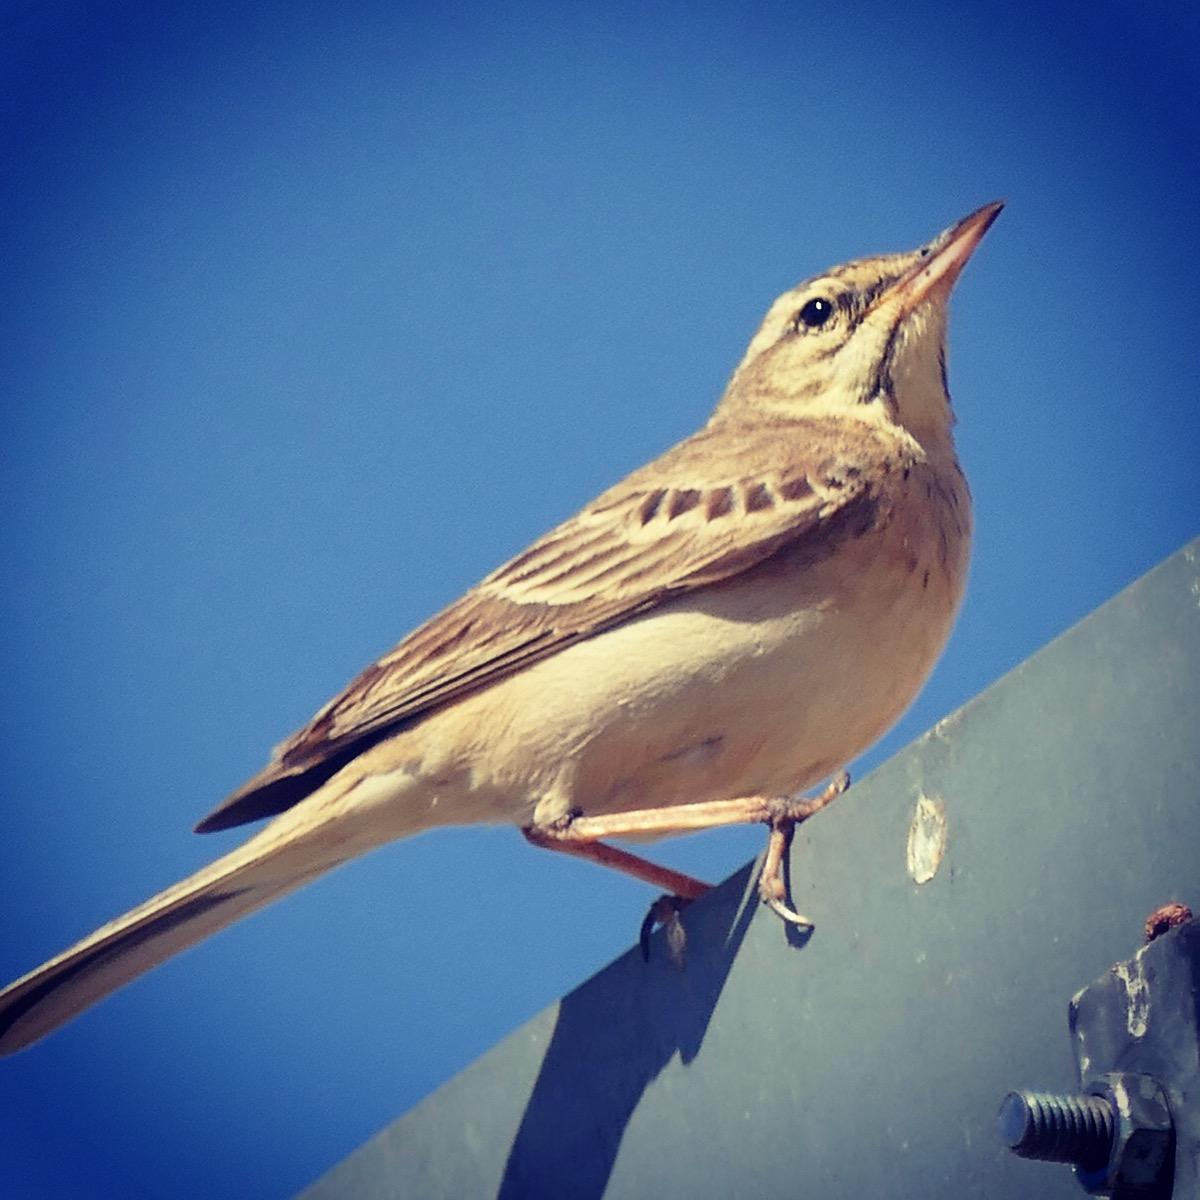 This Tawny Pipit was Noah's 3,000th bird of the year. Noah Strycker